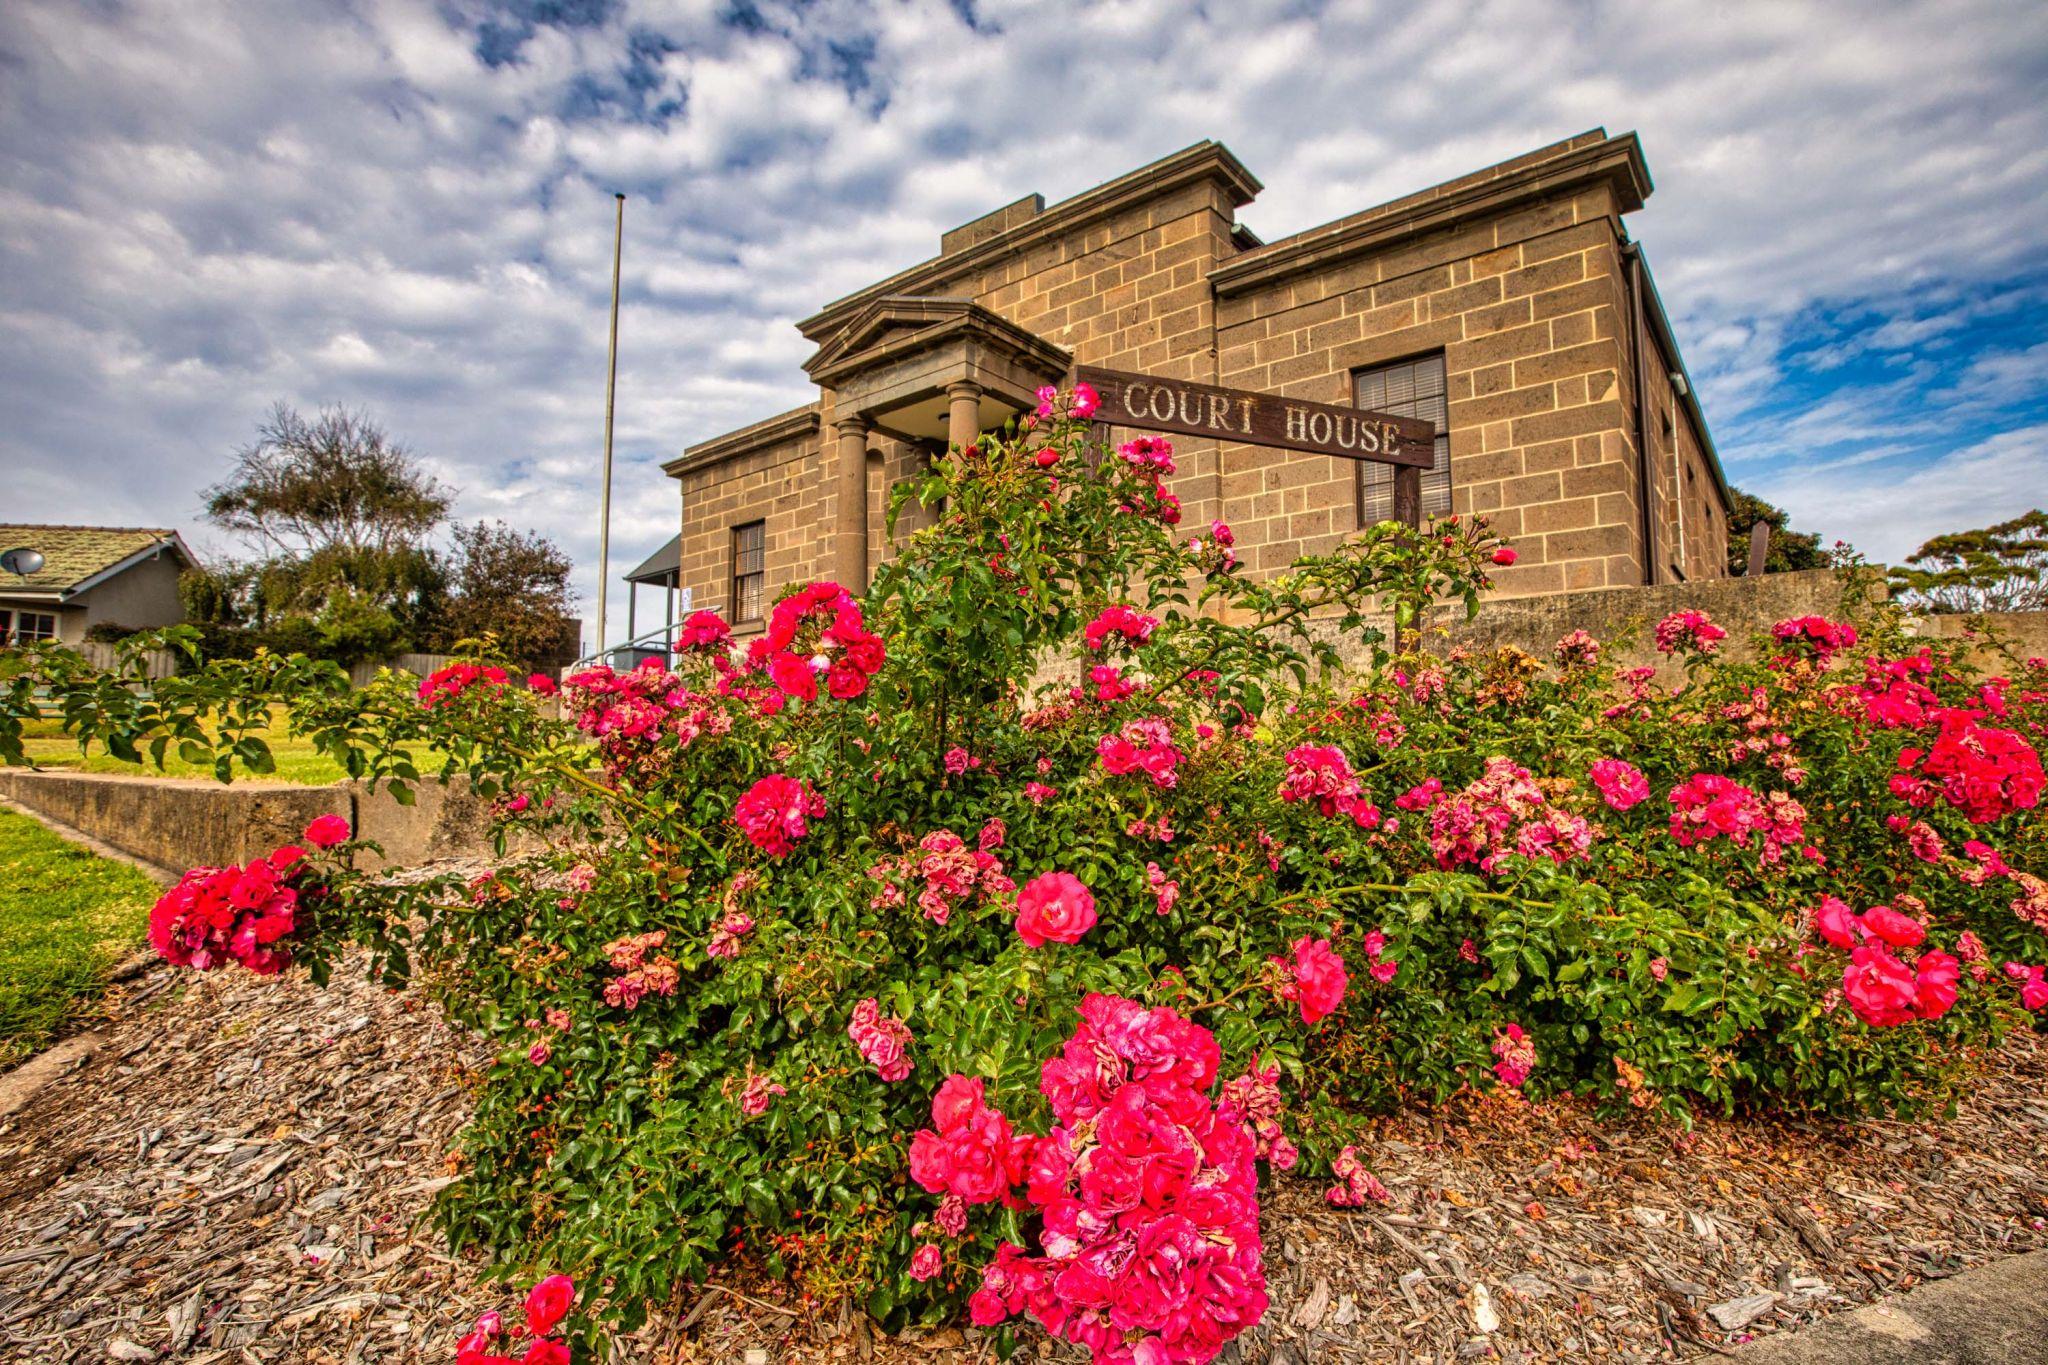 Court House, Portland, Victoria, Australia